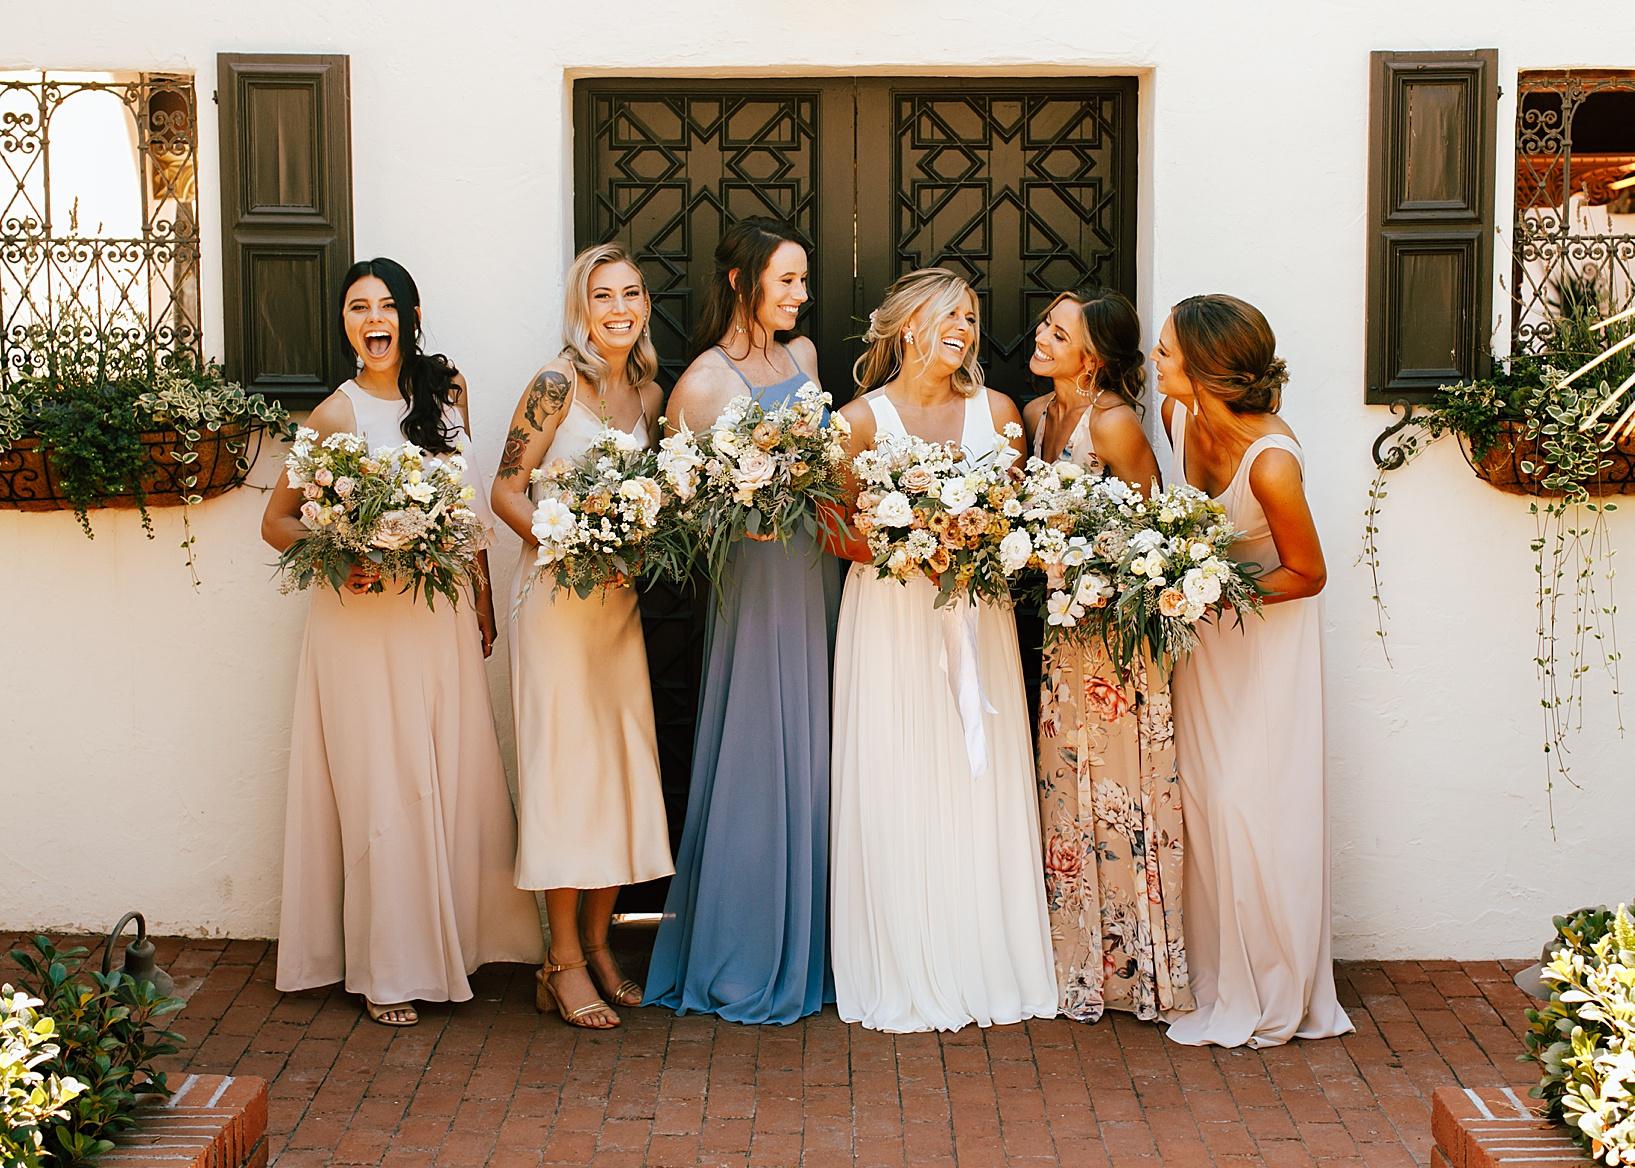 wedding party for La Jolla, Ca wedding at TThe Darlington House